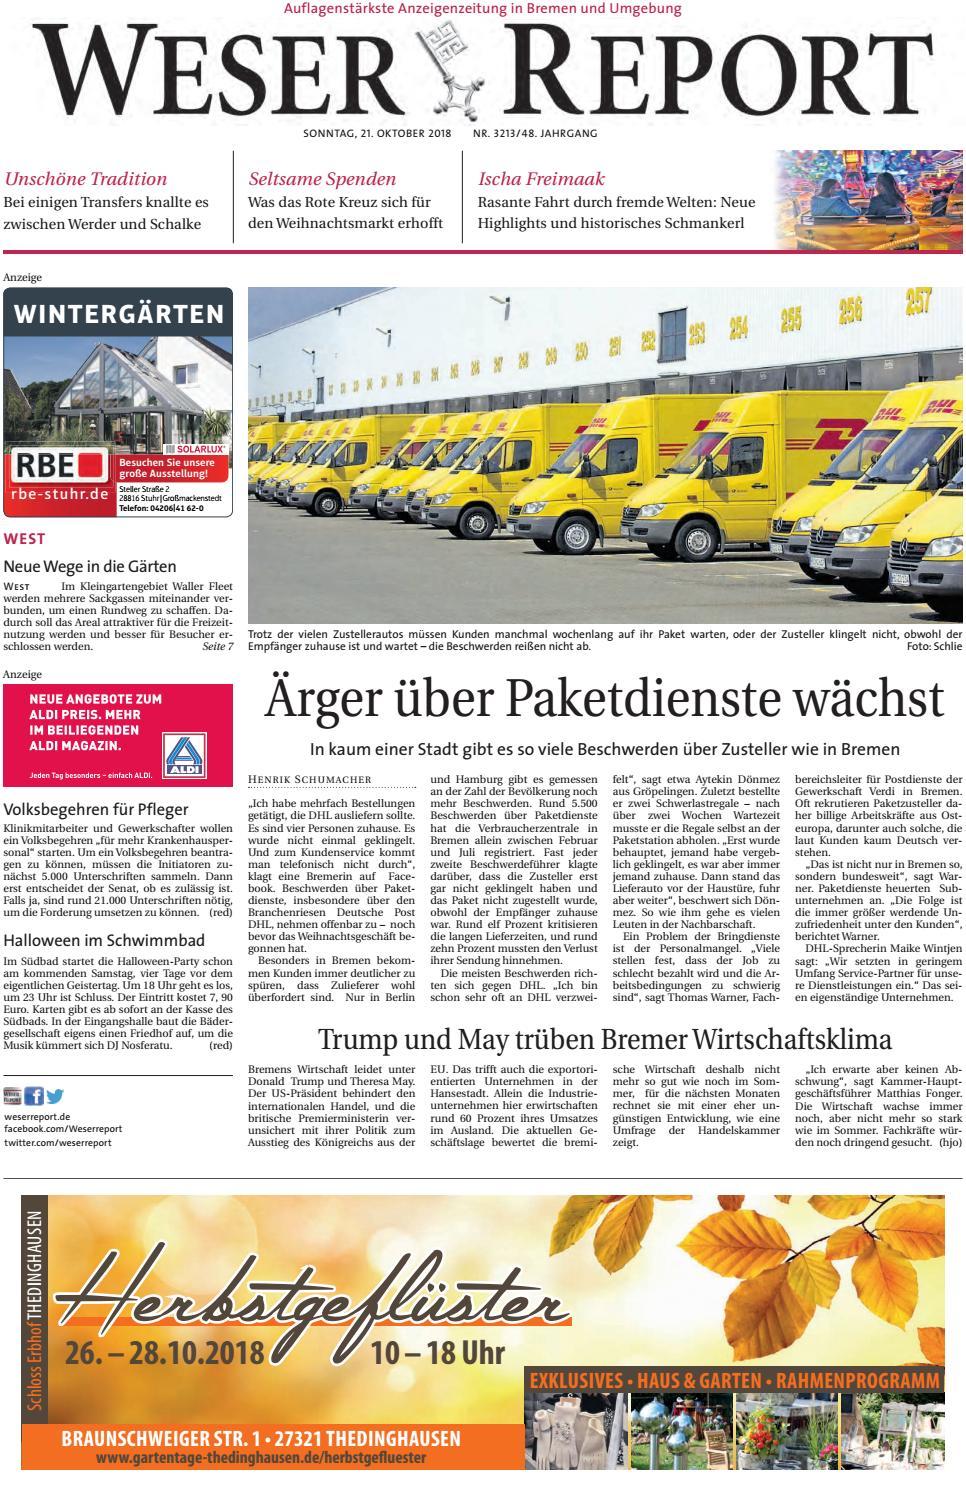 Weser Report - West vom 21.10.2018 by KPS Verlagsgesellschaft mbH ...